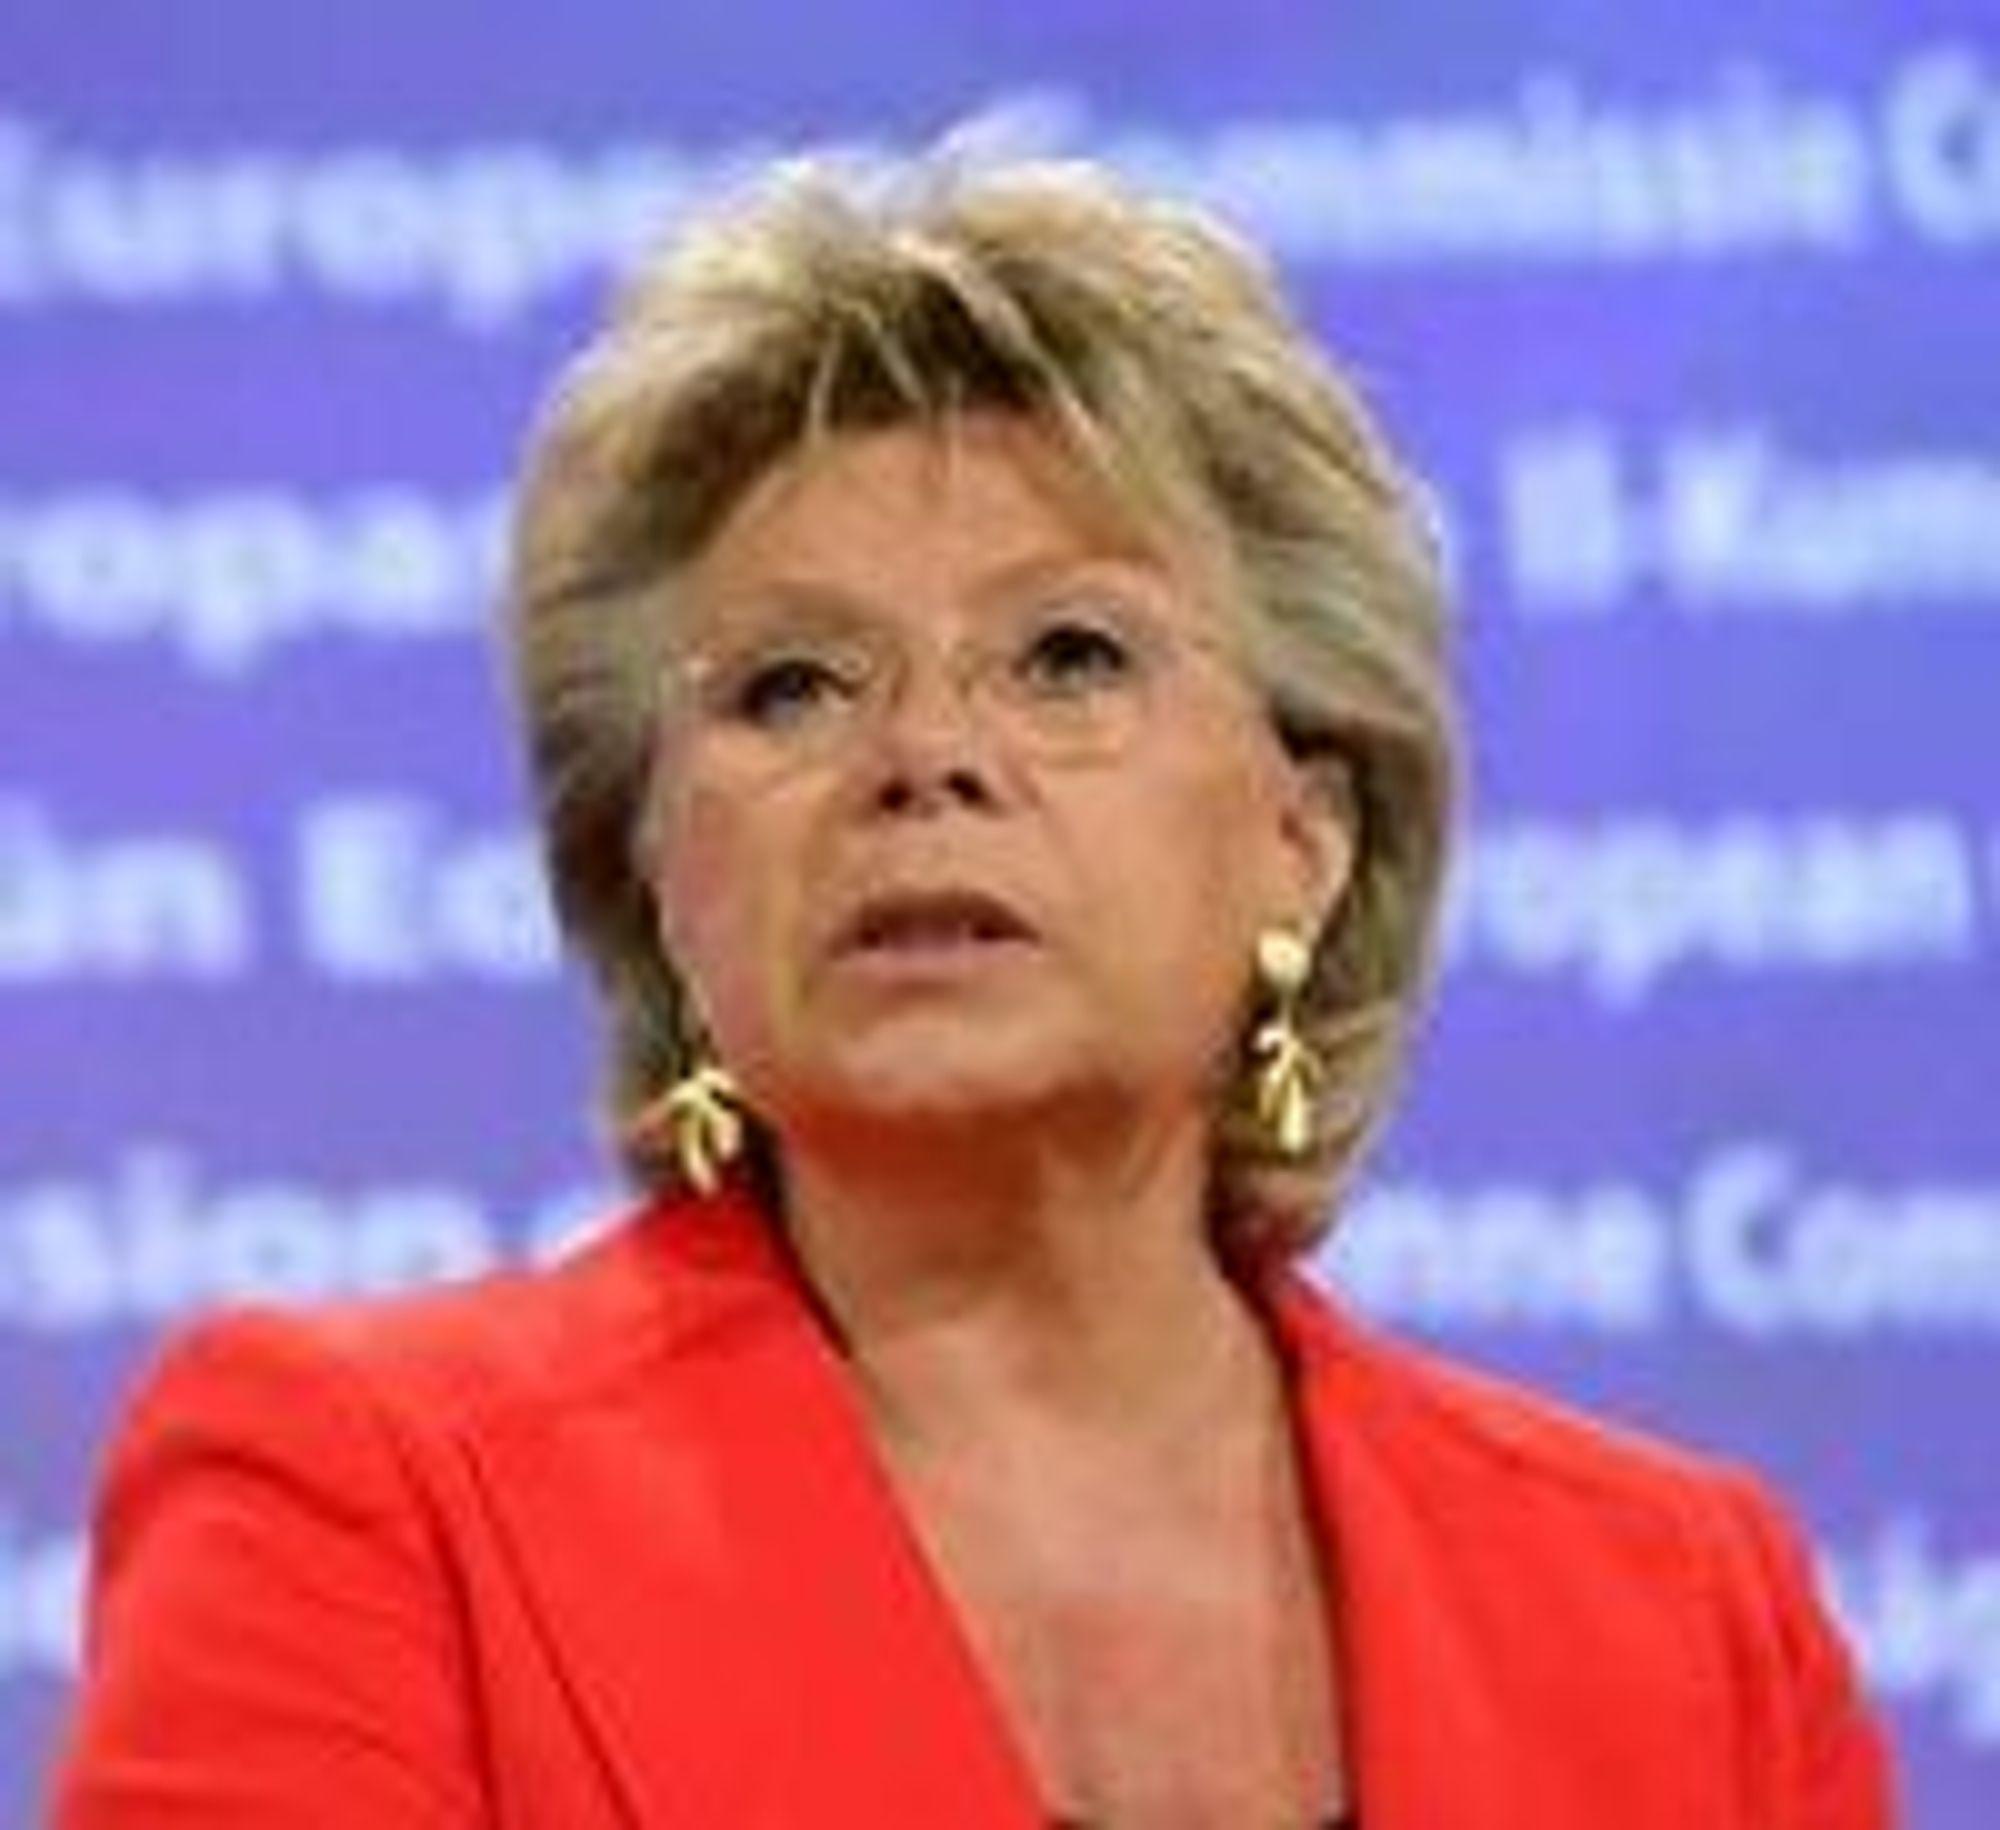 Som justiskommissær har Viviane Reding det øverste ansvaret for personvernarbeidet i EU.